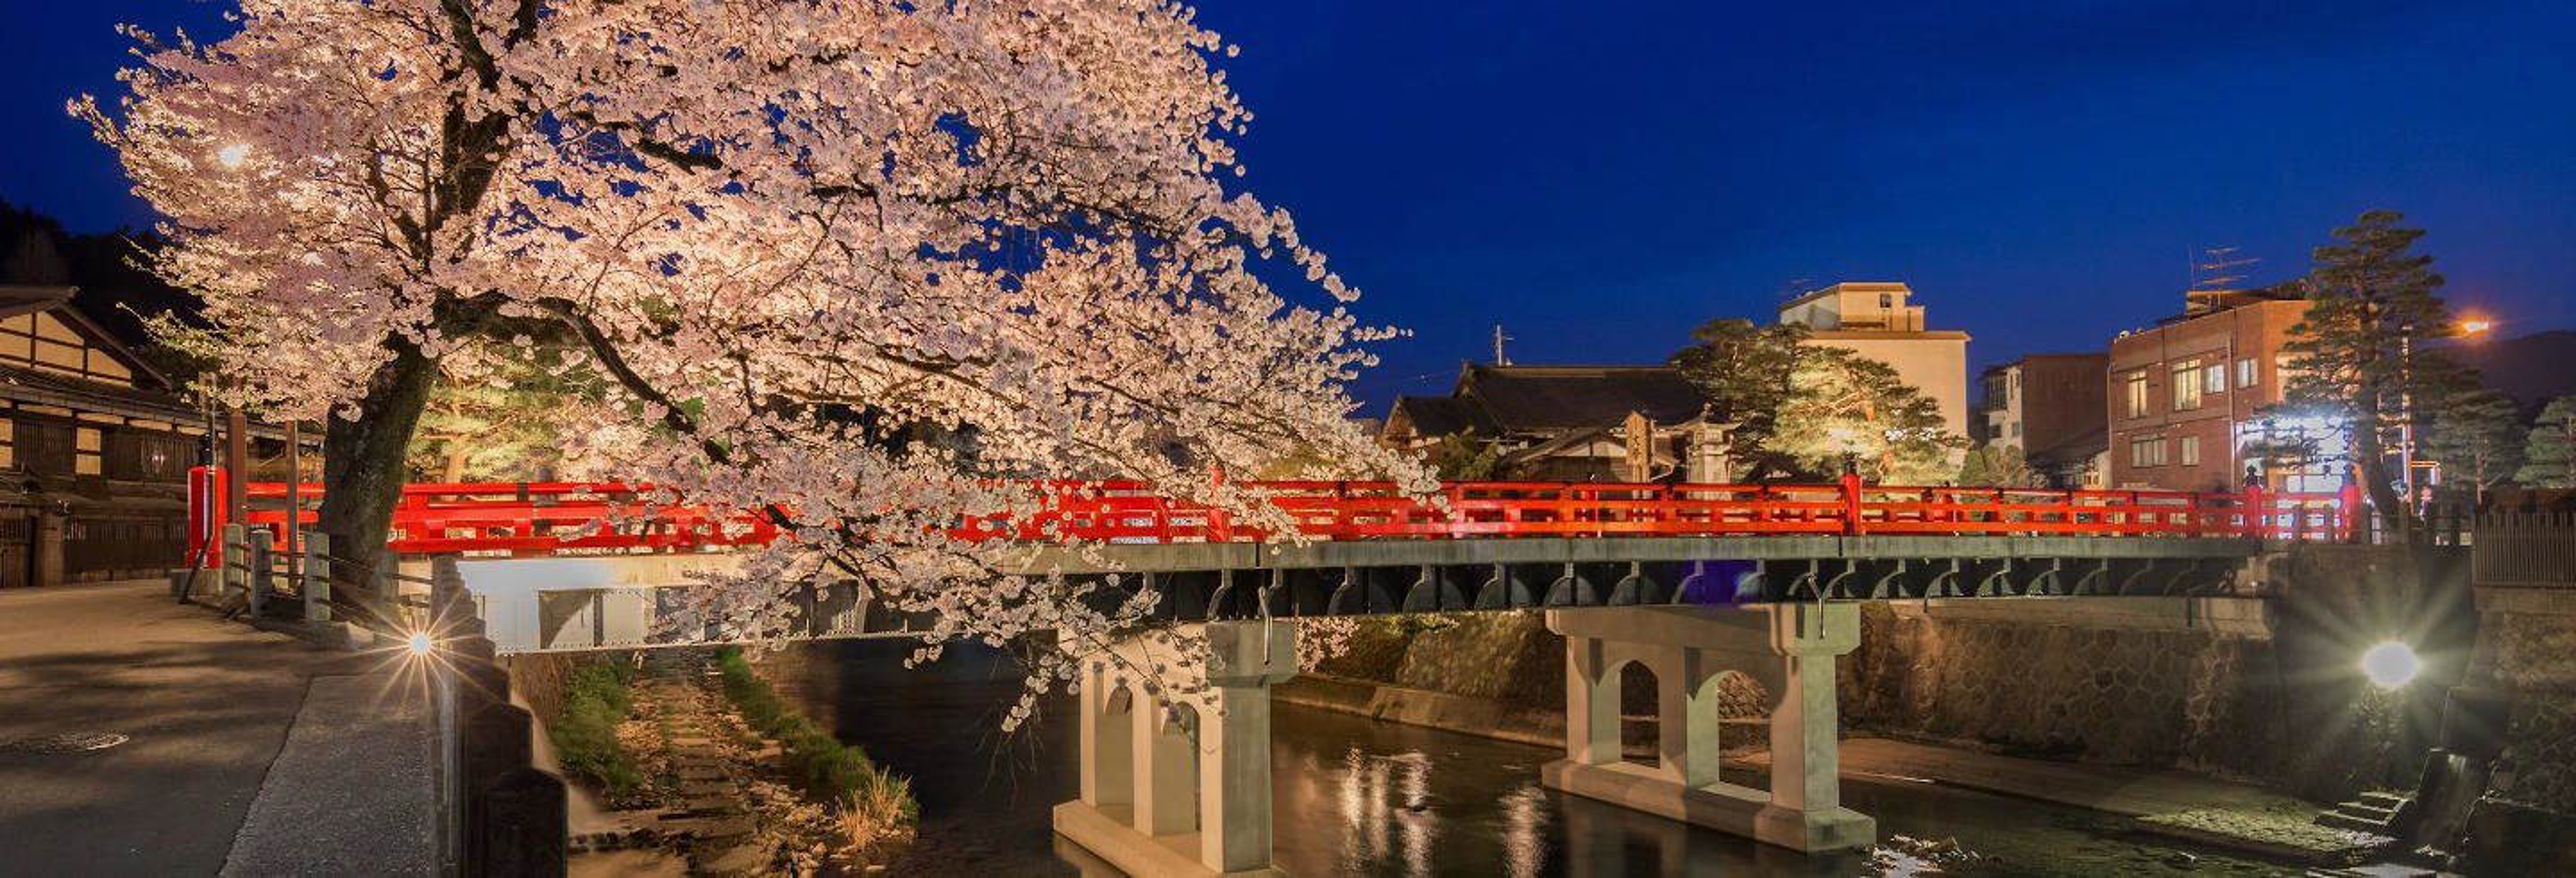 Tour nocturno por Takayama